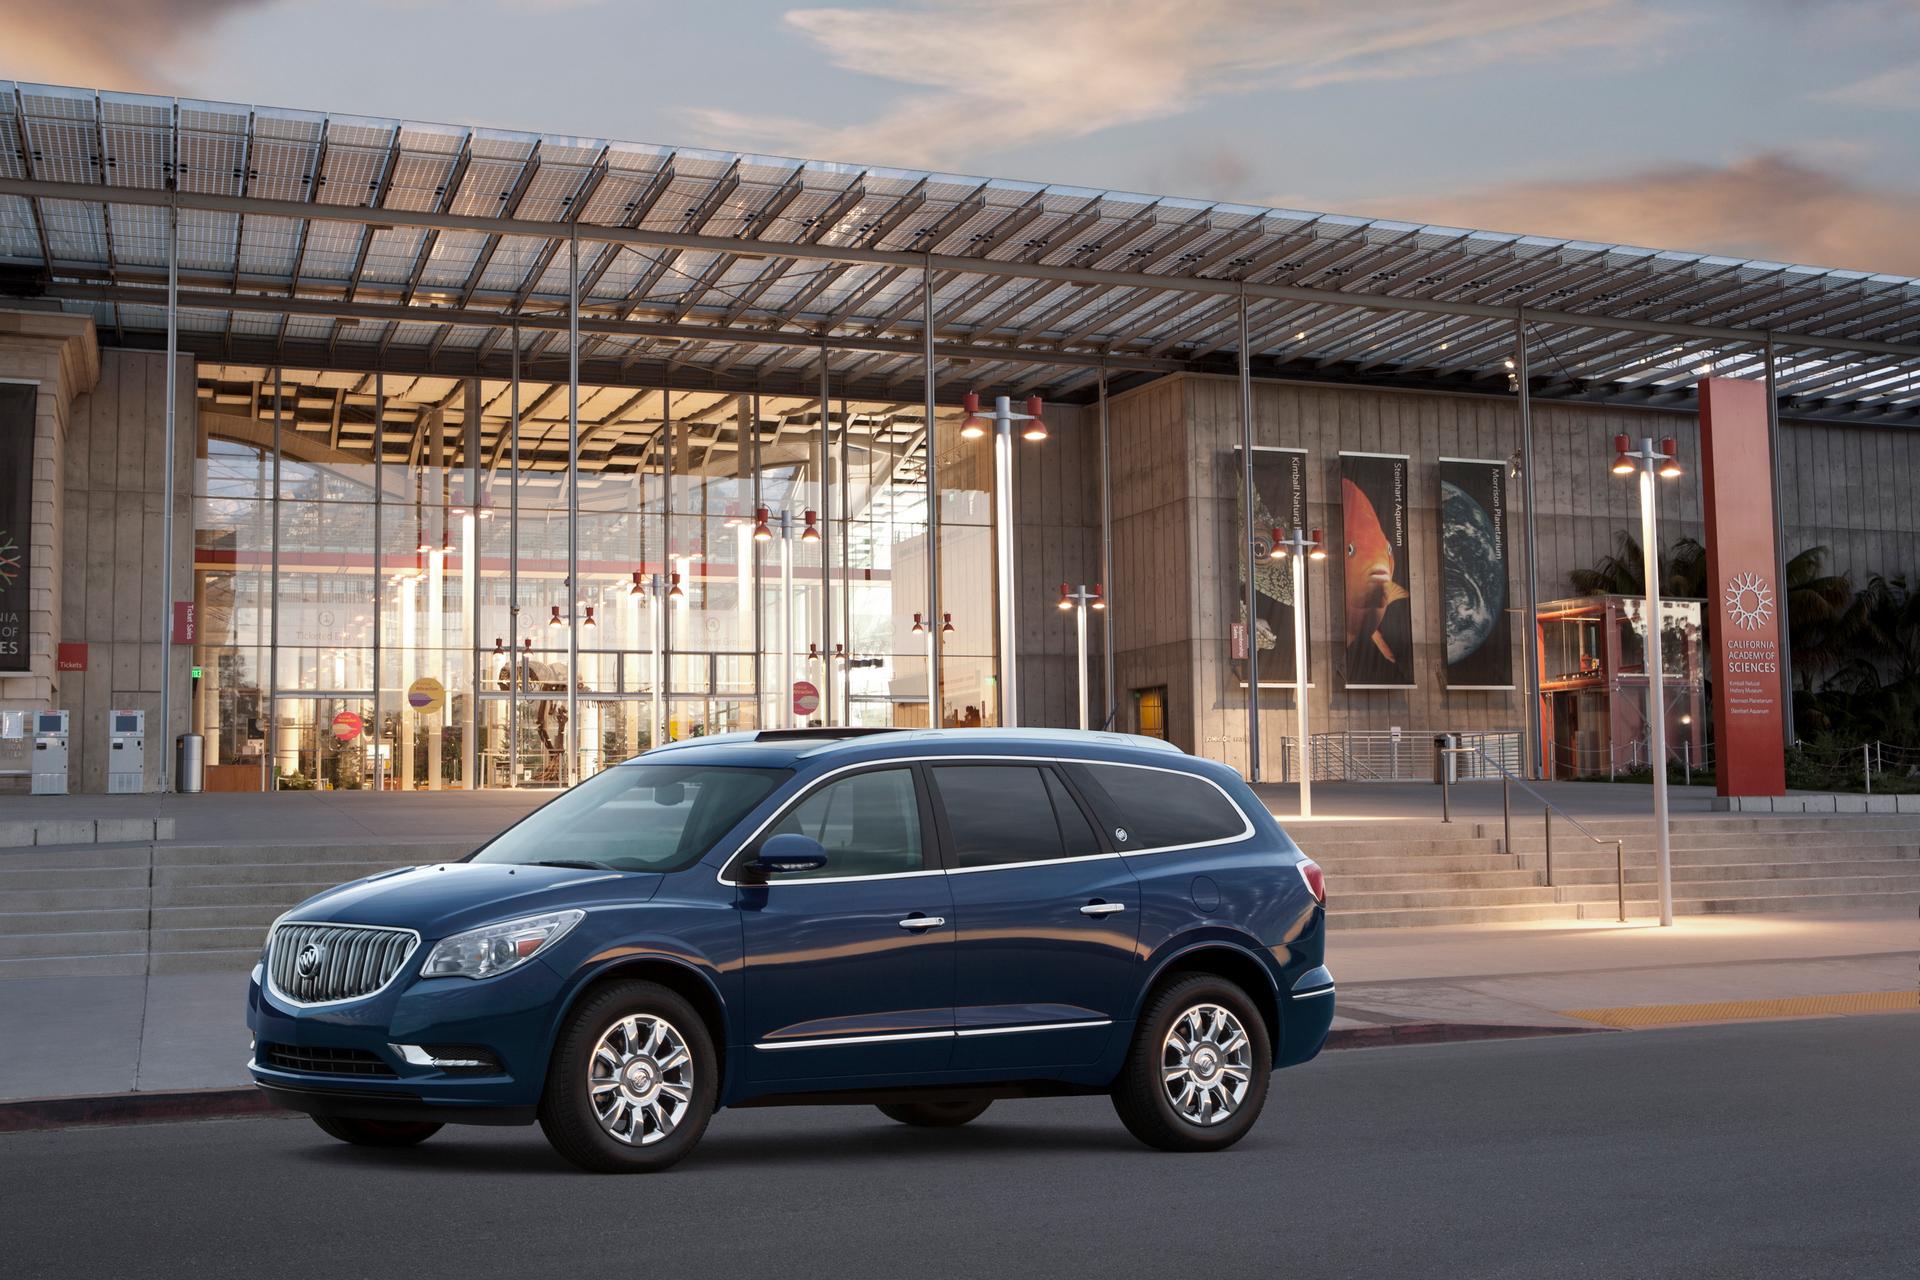 2016 Buick Enclave © General Motors